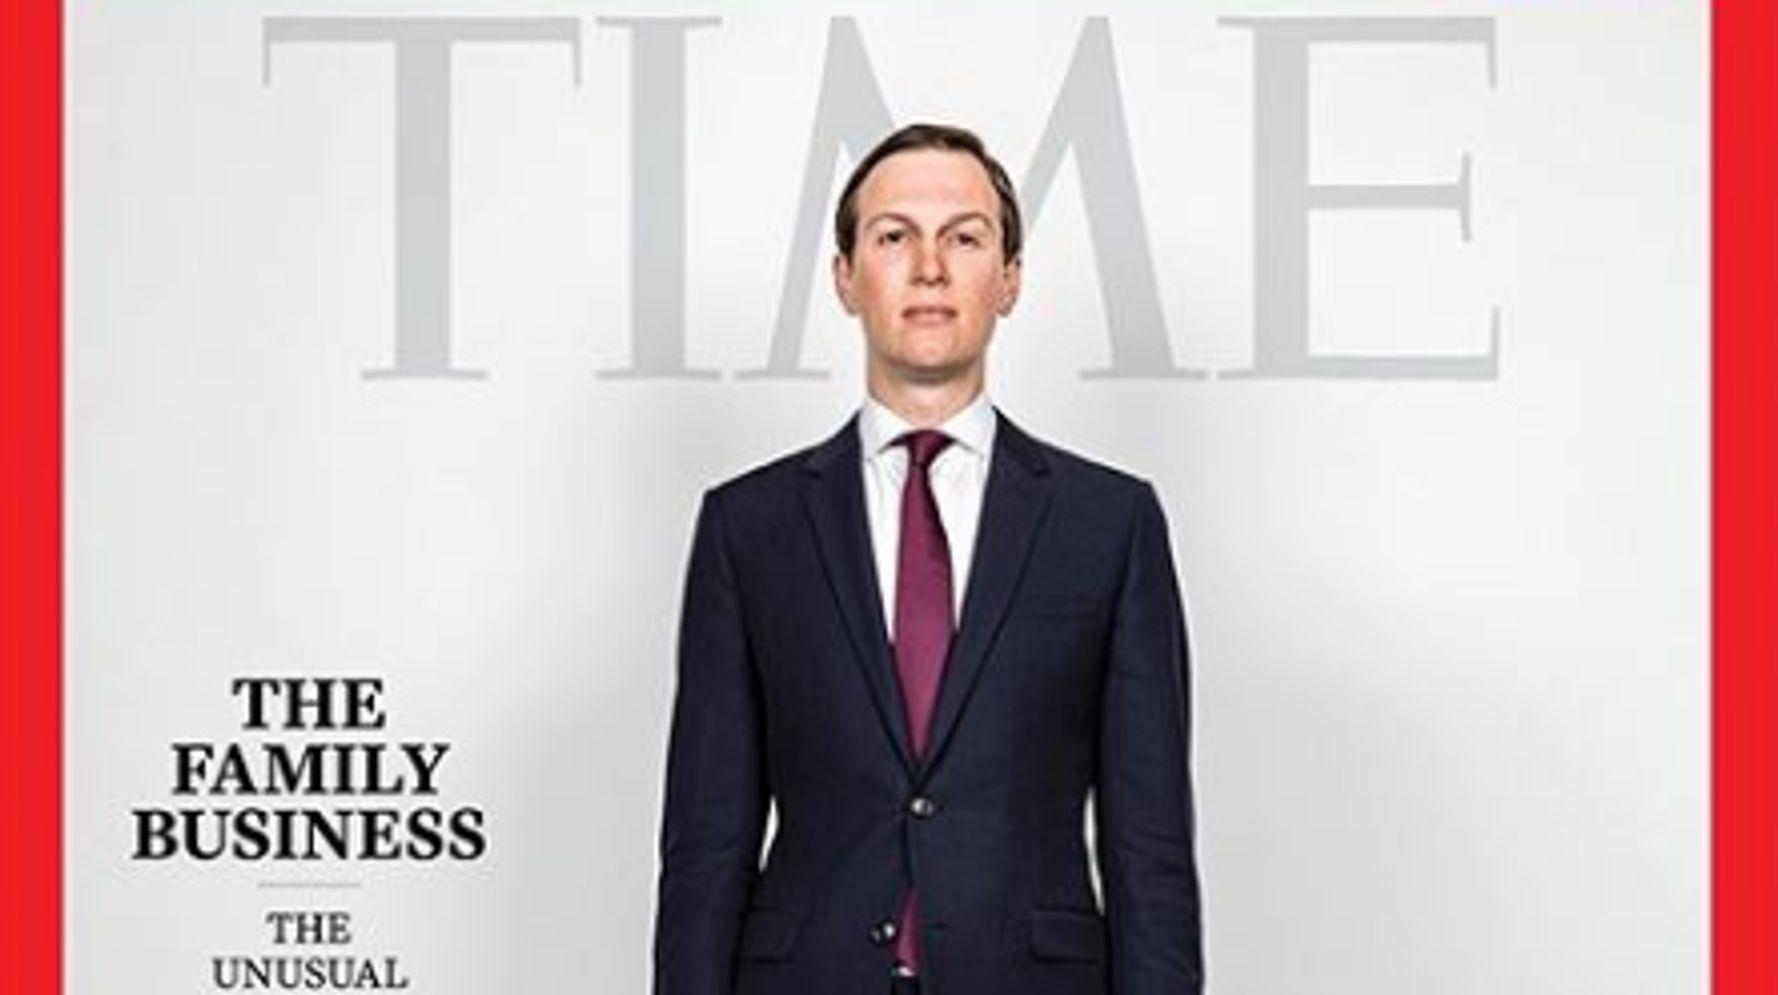 Westlake Legal Group 5e21808c2200005600472f17 Jared Kushner's New Time Magazine Cover Is Now A Brutal Meme